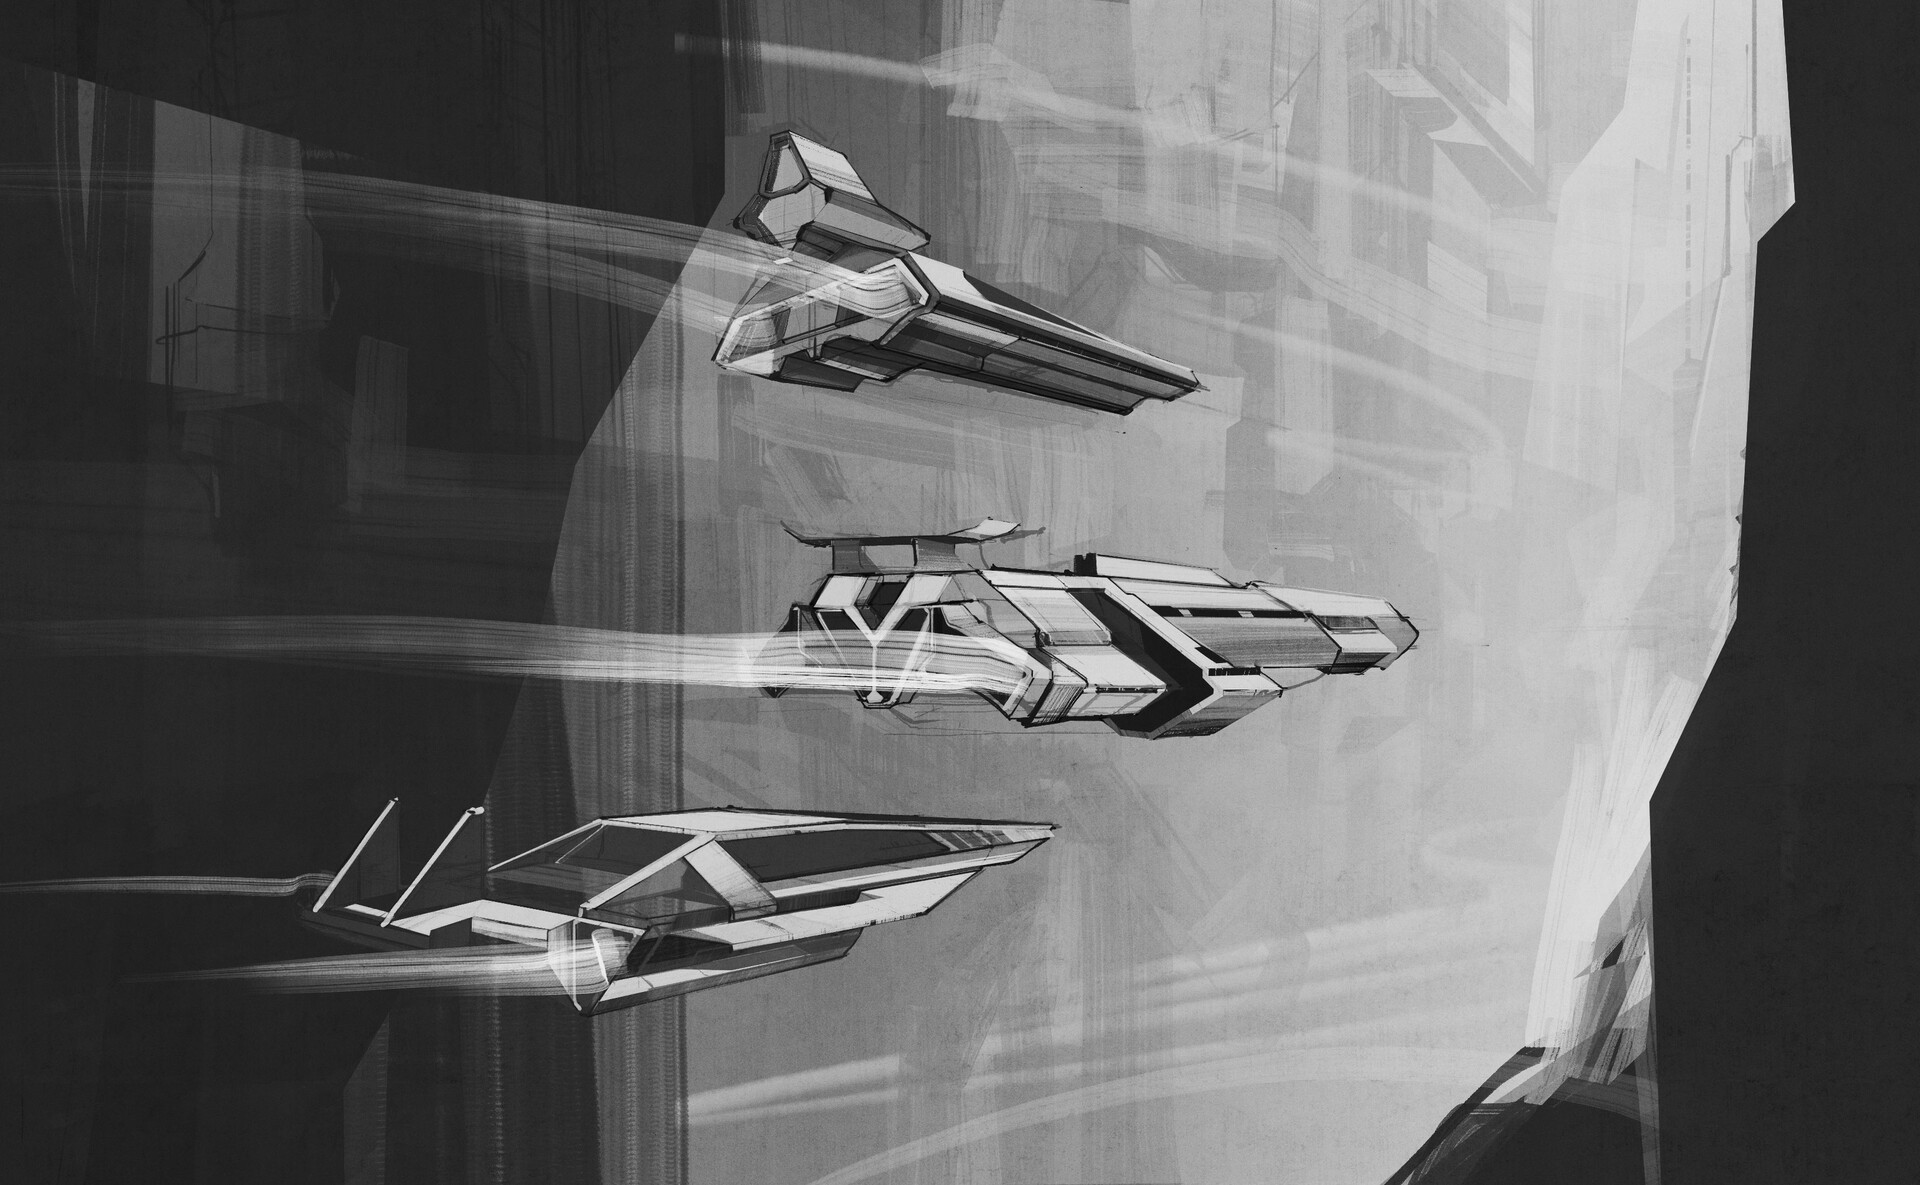 Anya allin space ships pablished 02